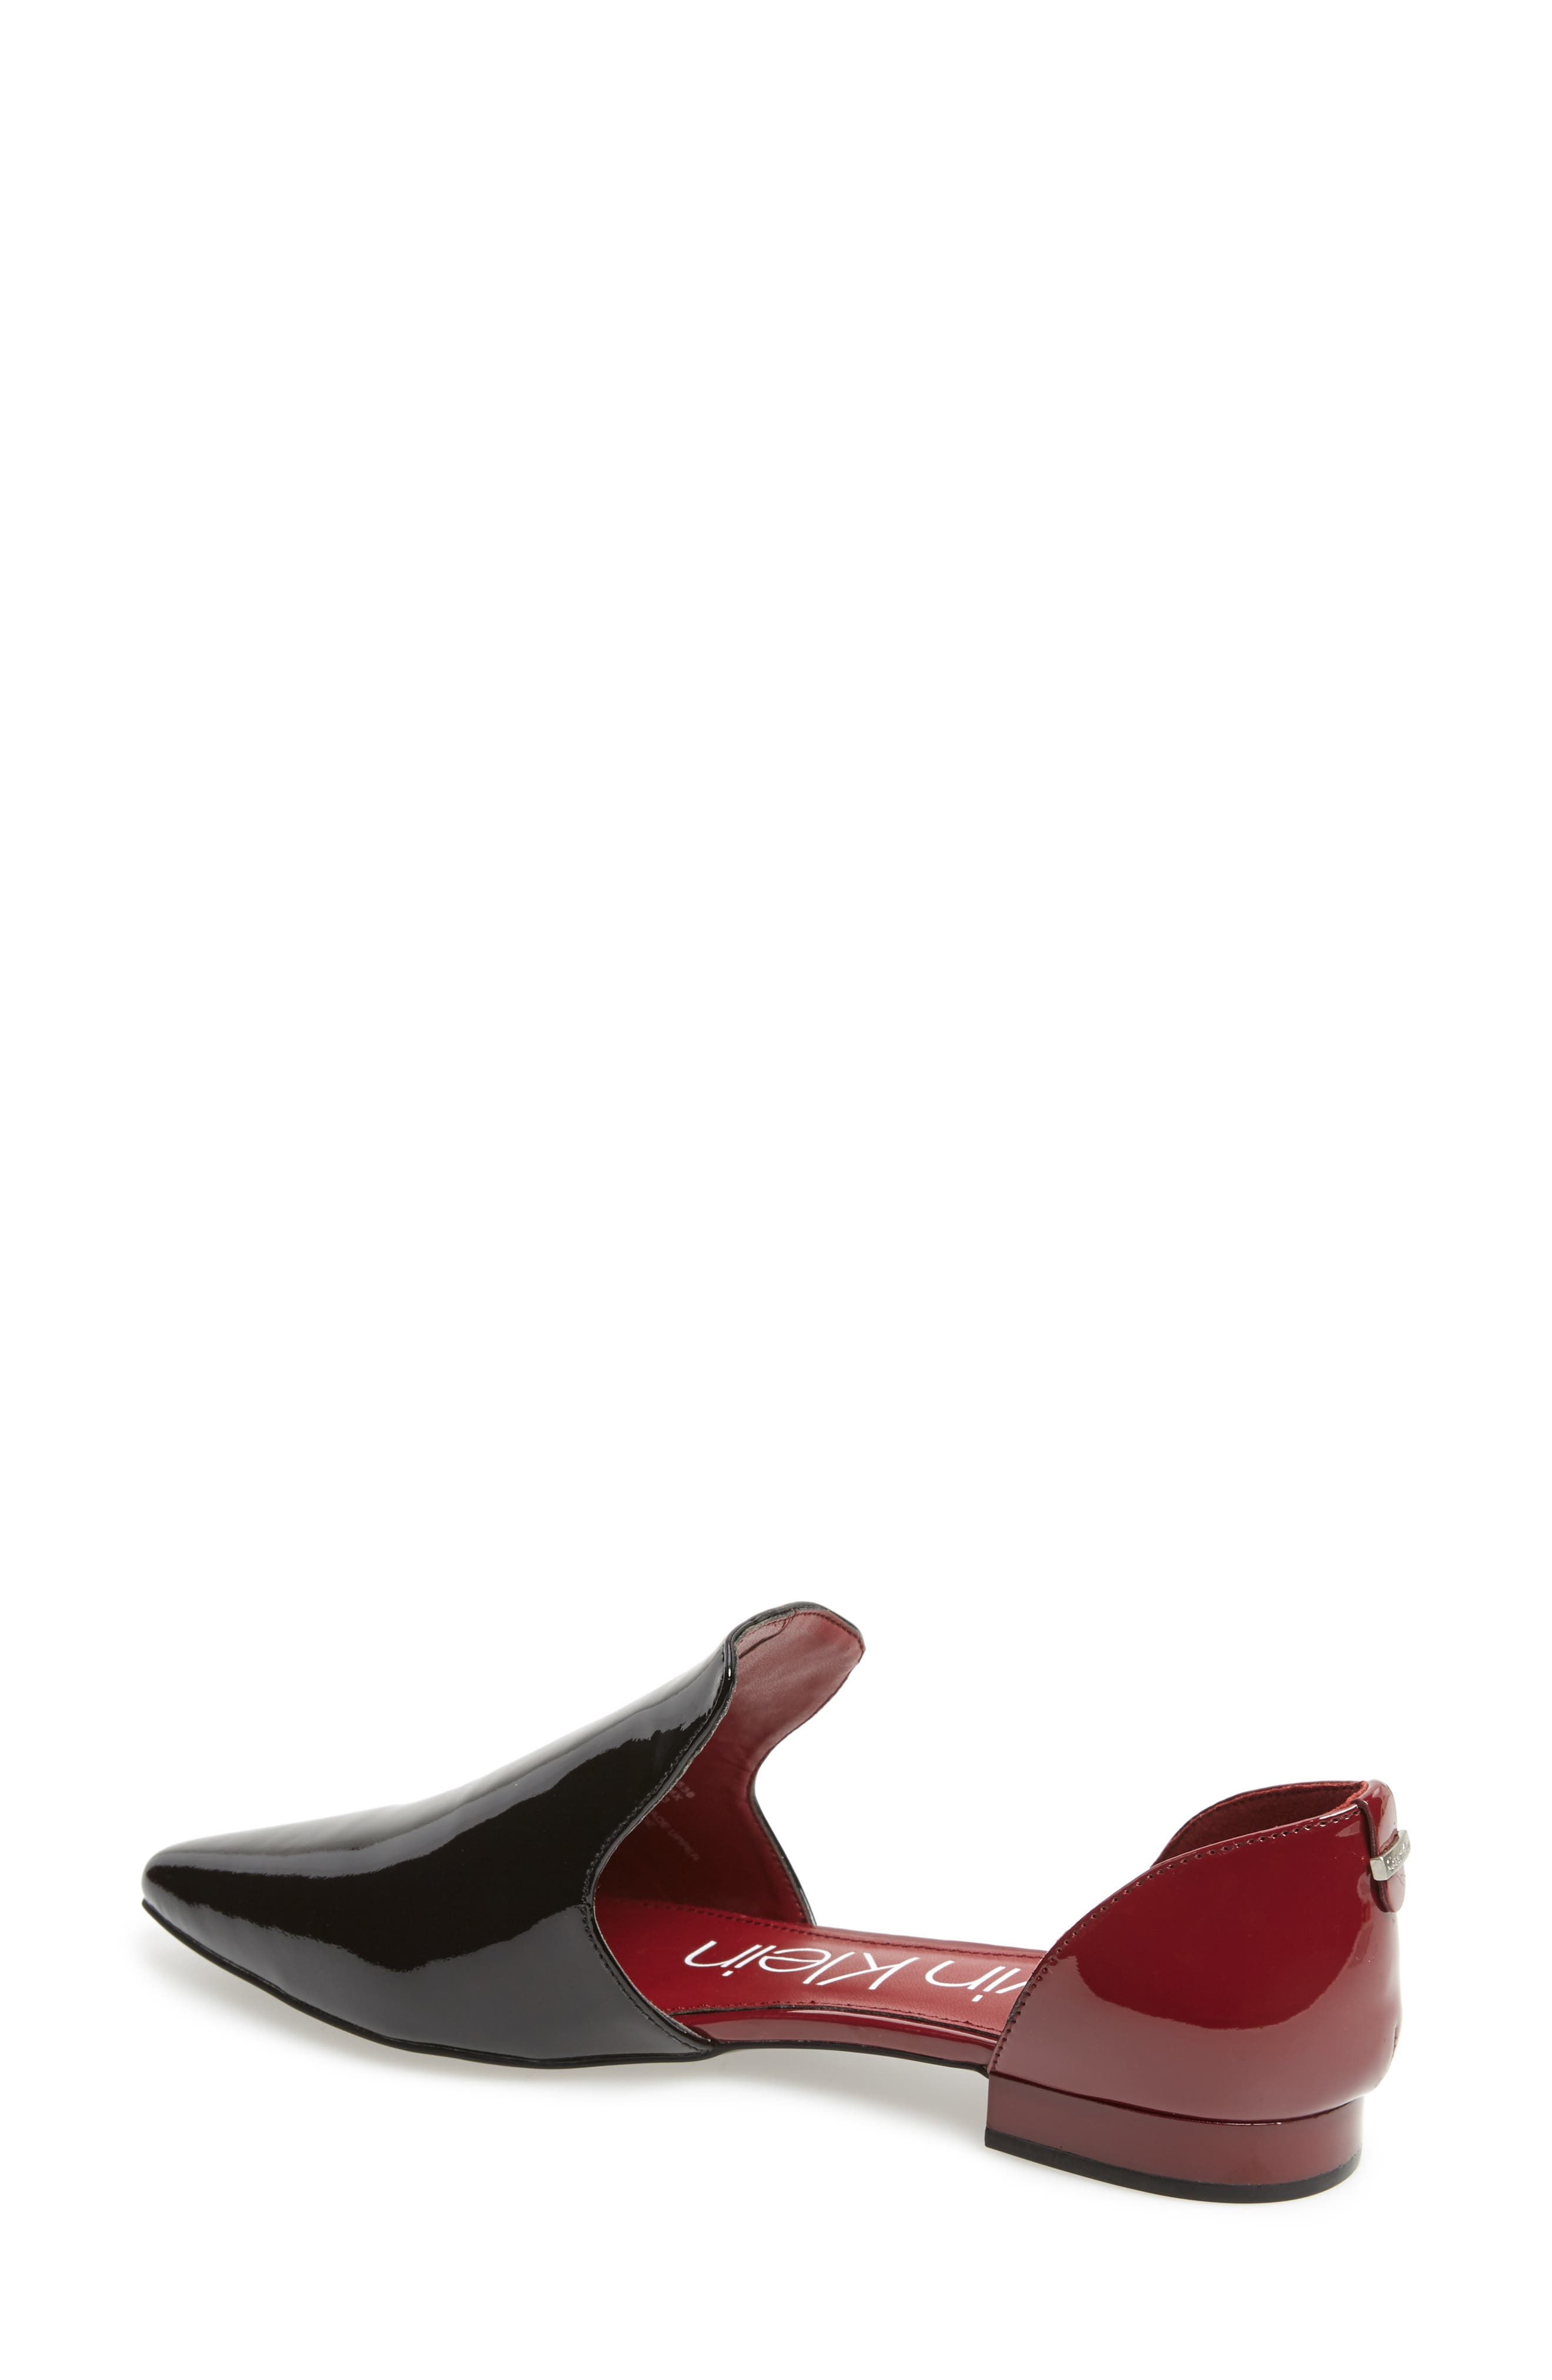 Edona Loafer Flat,                             Alternate thumbnail 2, color,                             BLACK/ RED ROCK PATENT